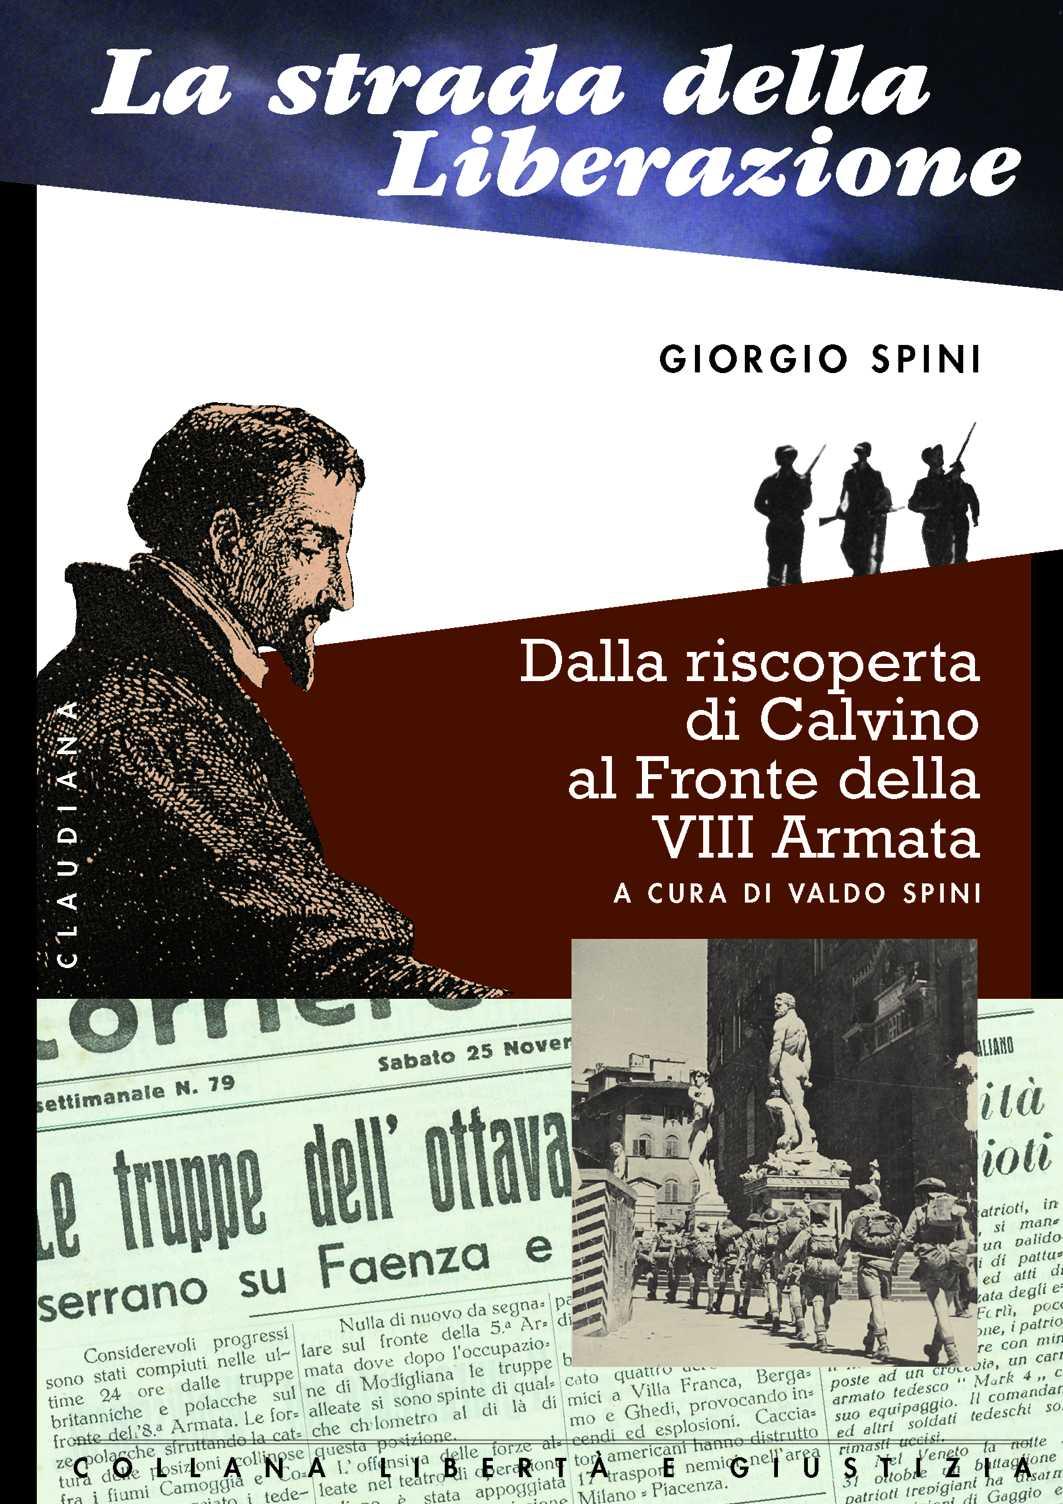 11 agosto: Firenze libera!